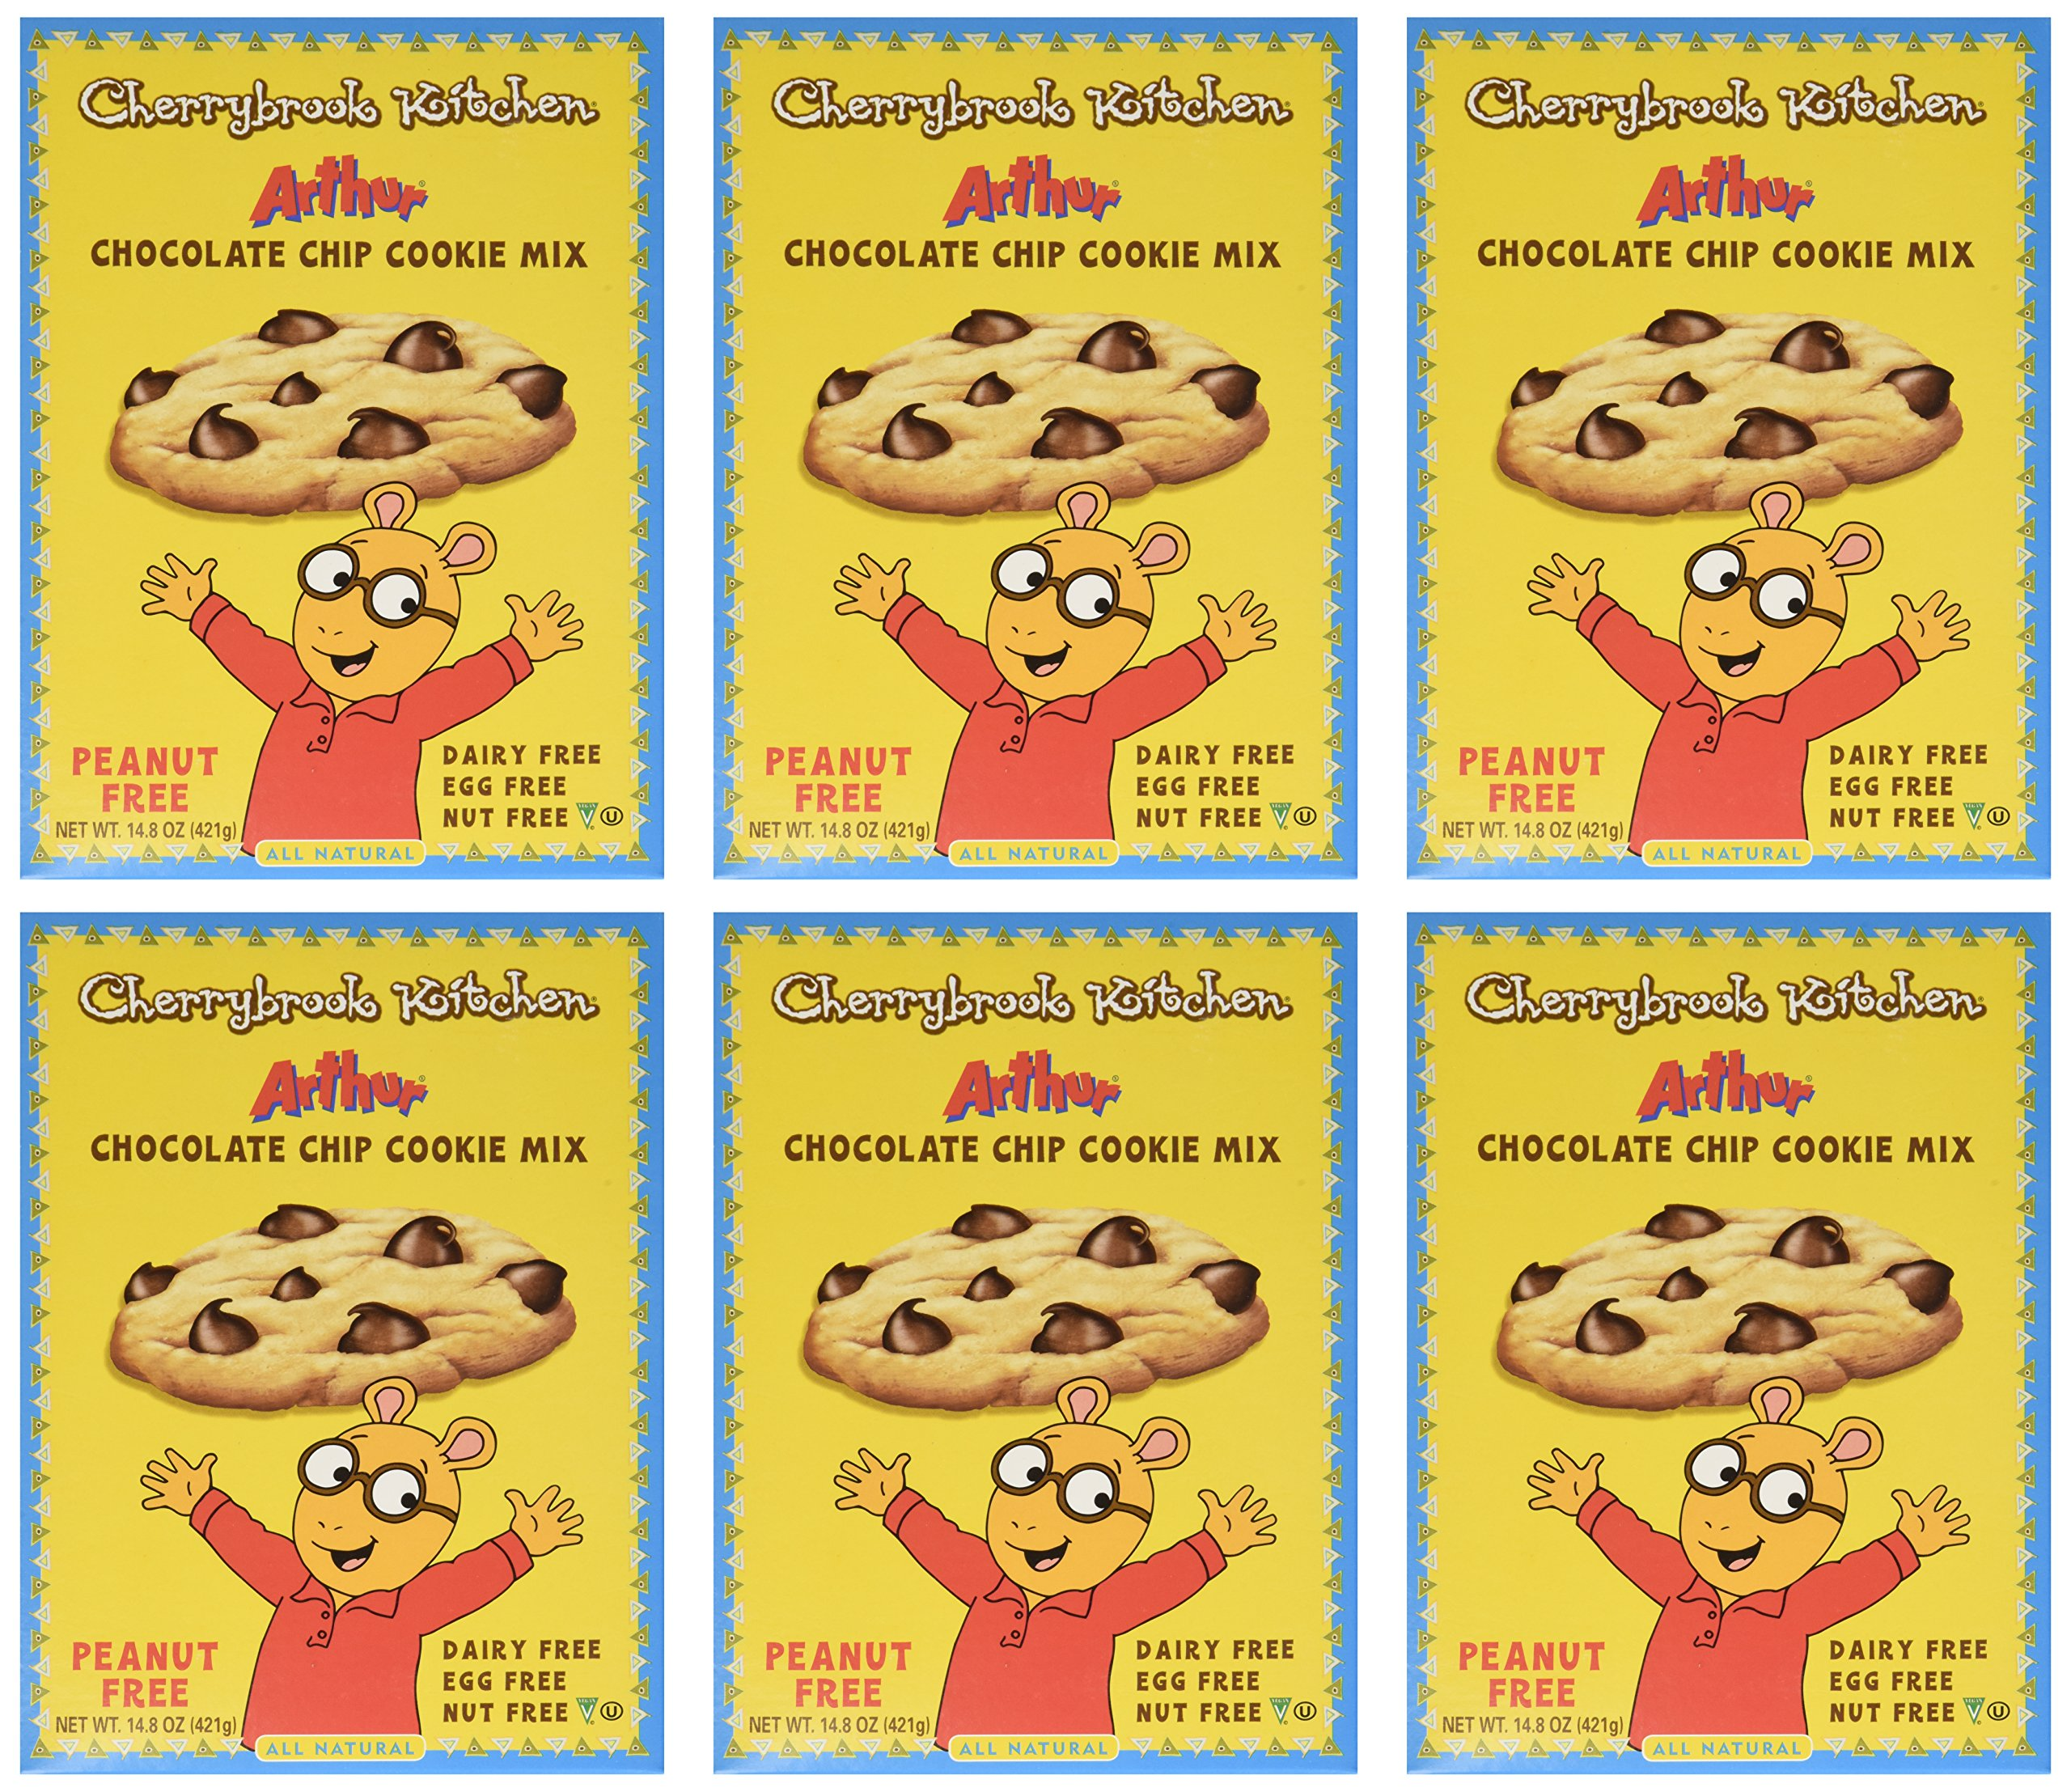 Cherrybrook Kitchen Arthur Chocolate Chip Cookie Mix, 14.8 oz (Pack of 6) by Cherrybrook Kitchen